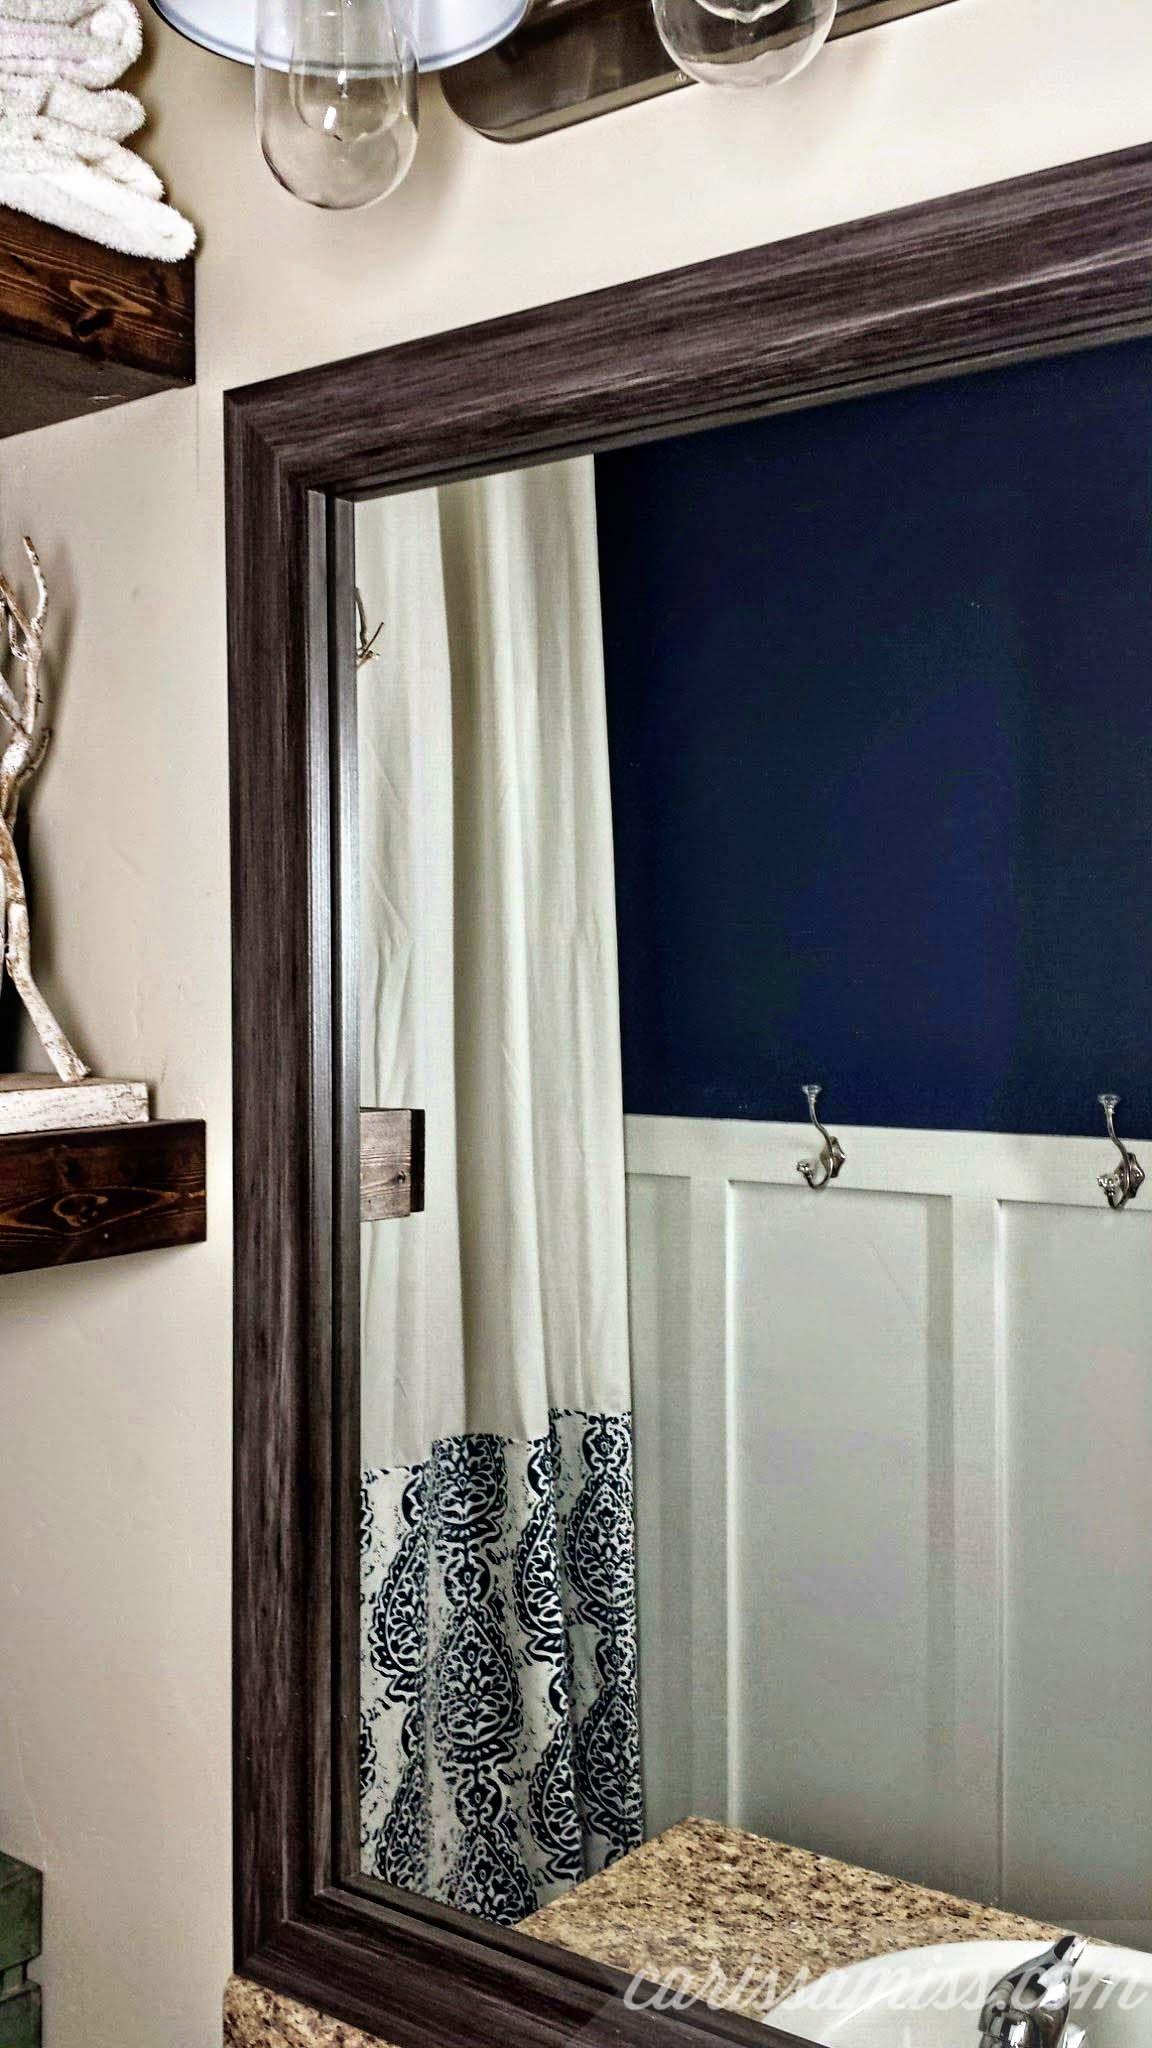 Cherokee montauk driftwood driftwood and small bathroom